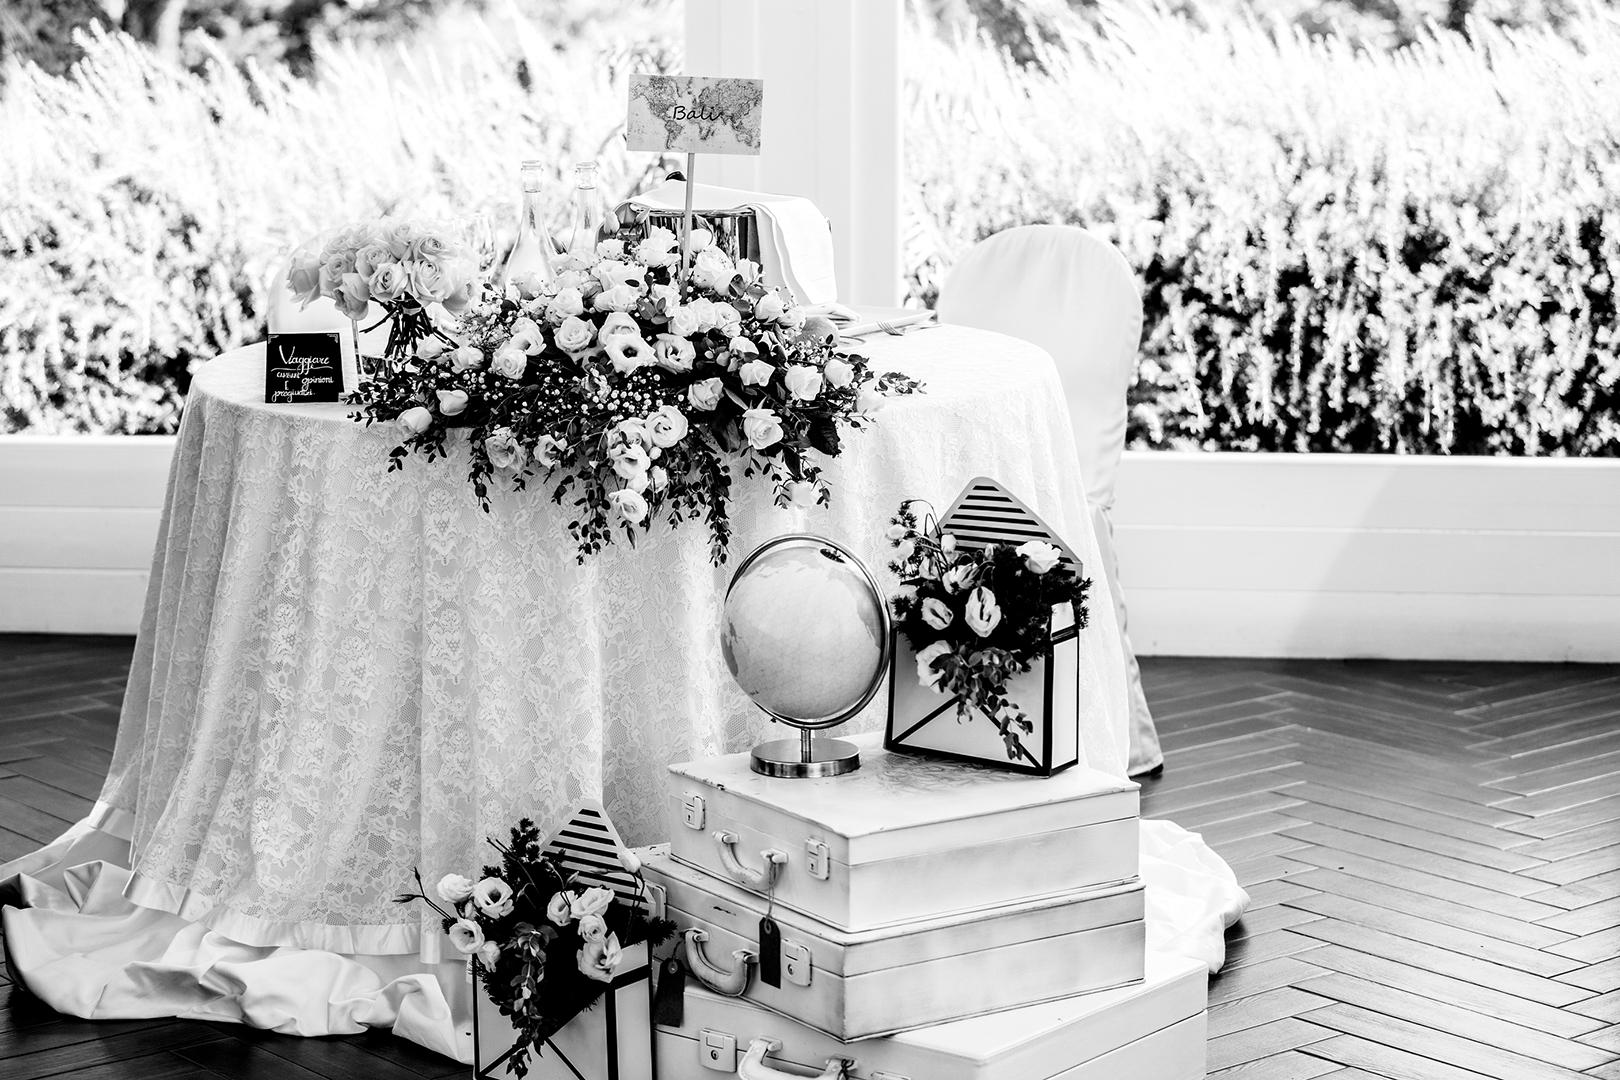 49 gianni-lepore-tavolo-sposi-imperiale